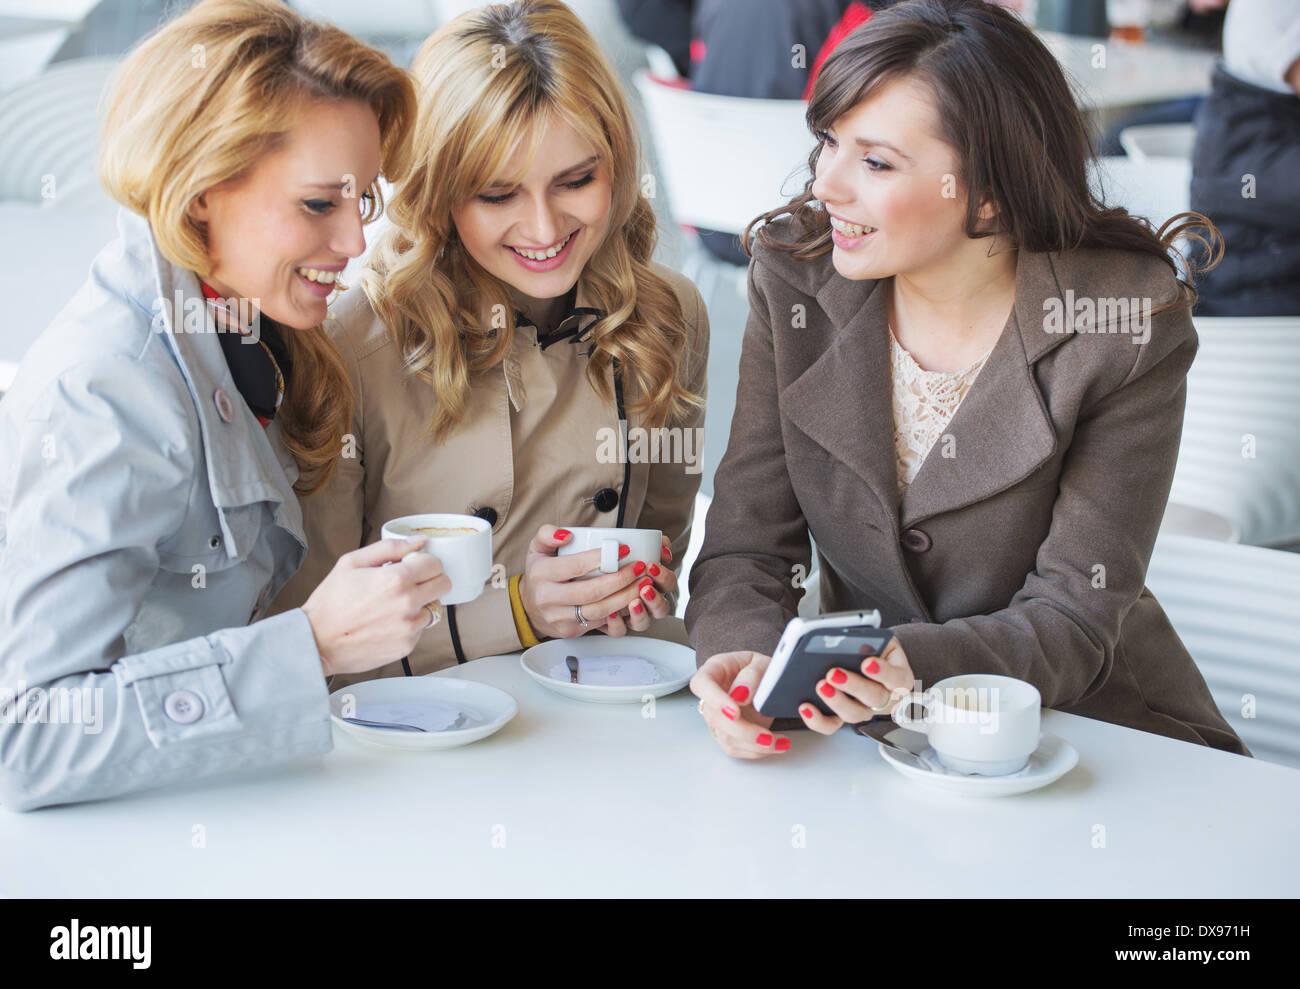 Freundinnen in der Kaffee-Pause Stockbild